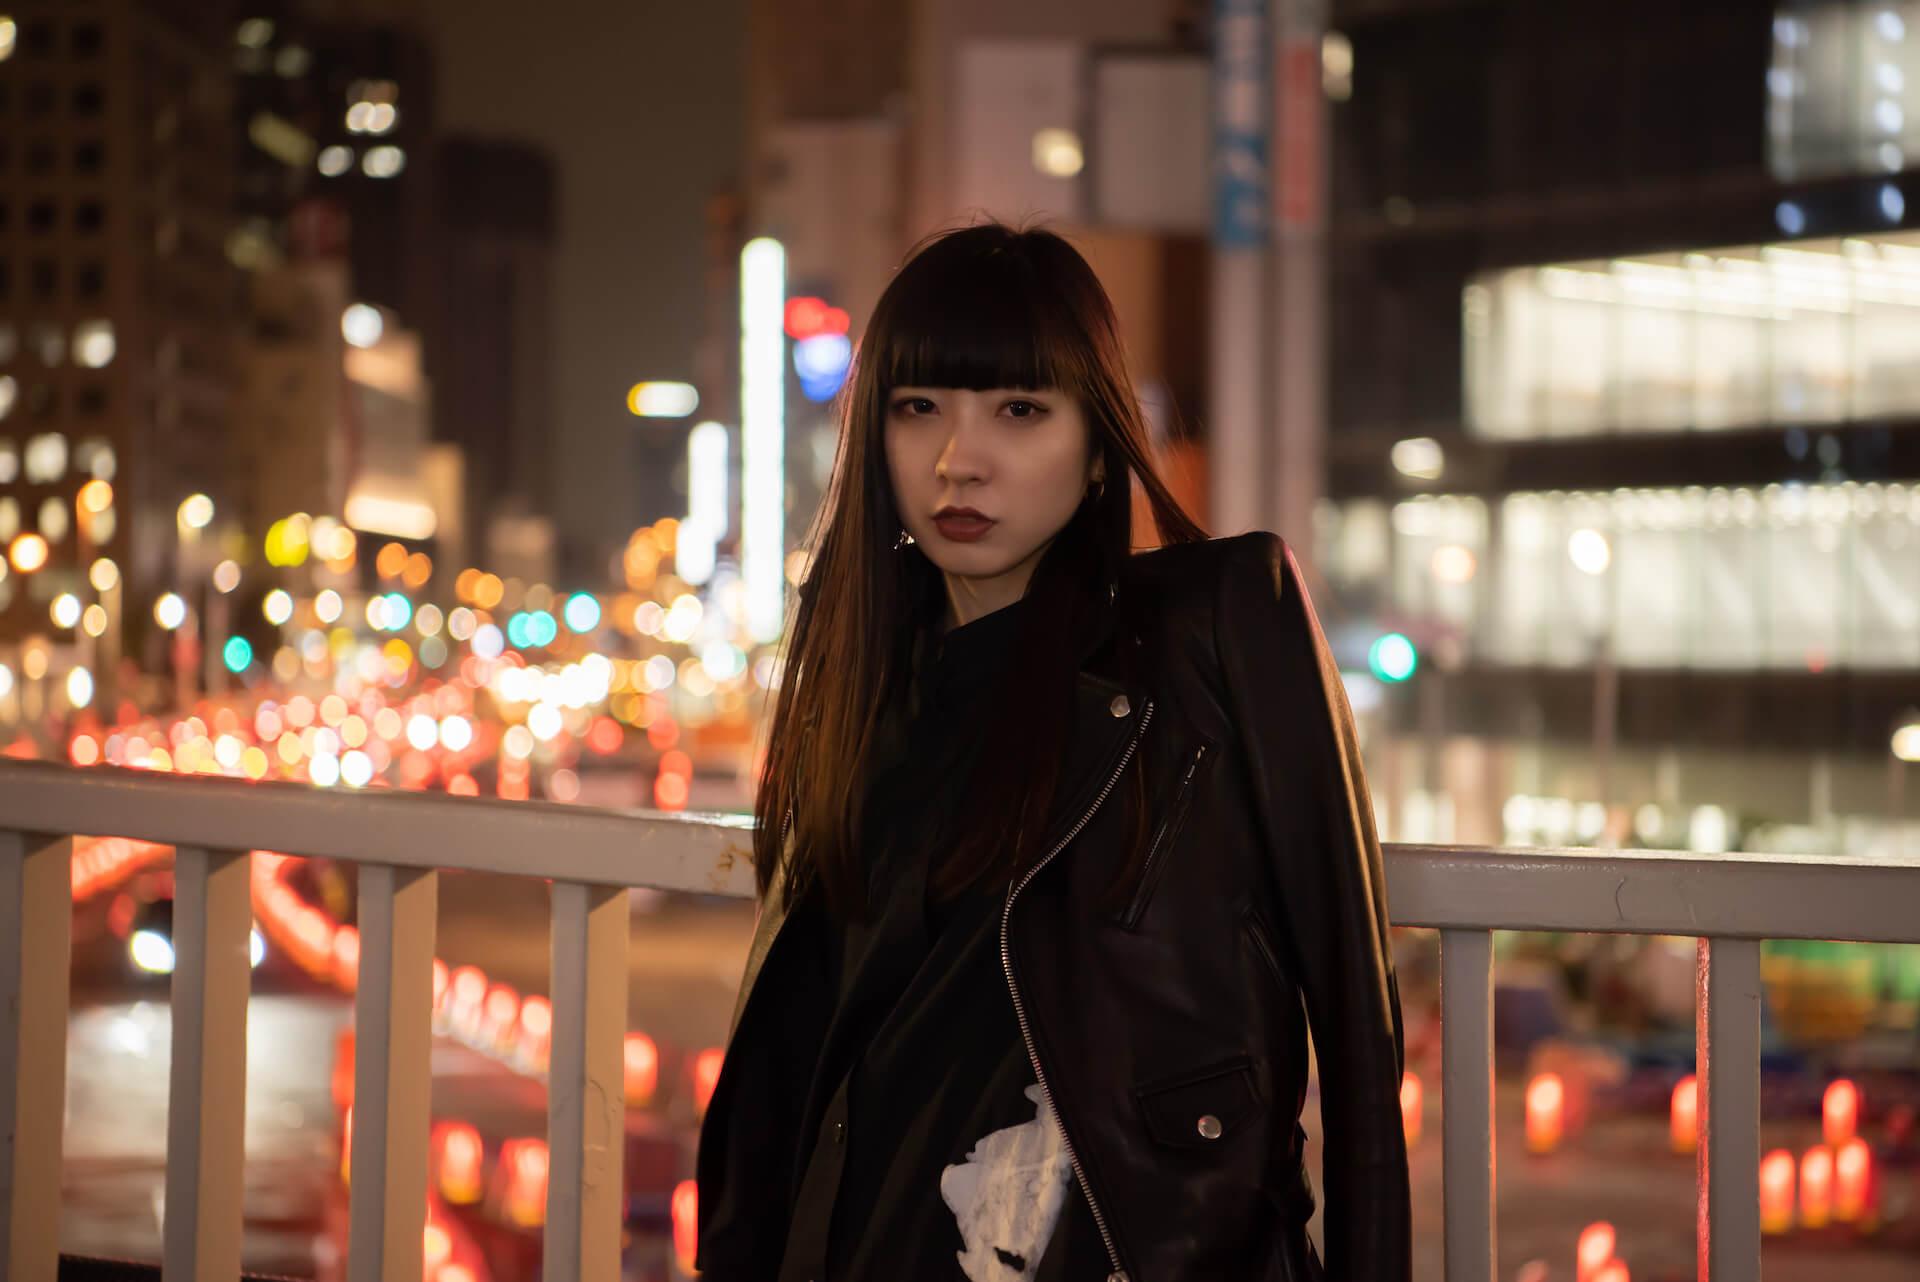 CIRCUS TOKYOで開催される<N.A.S.A.>にUSテクノシーンの奇才Matrixxmanが来日 国内からはRisa Taniguchi、Masafumi Takeらが登場 music190920-matrixxman-1